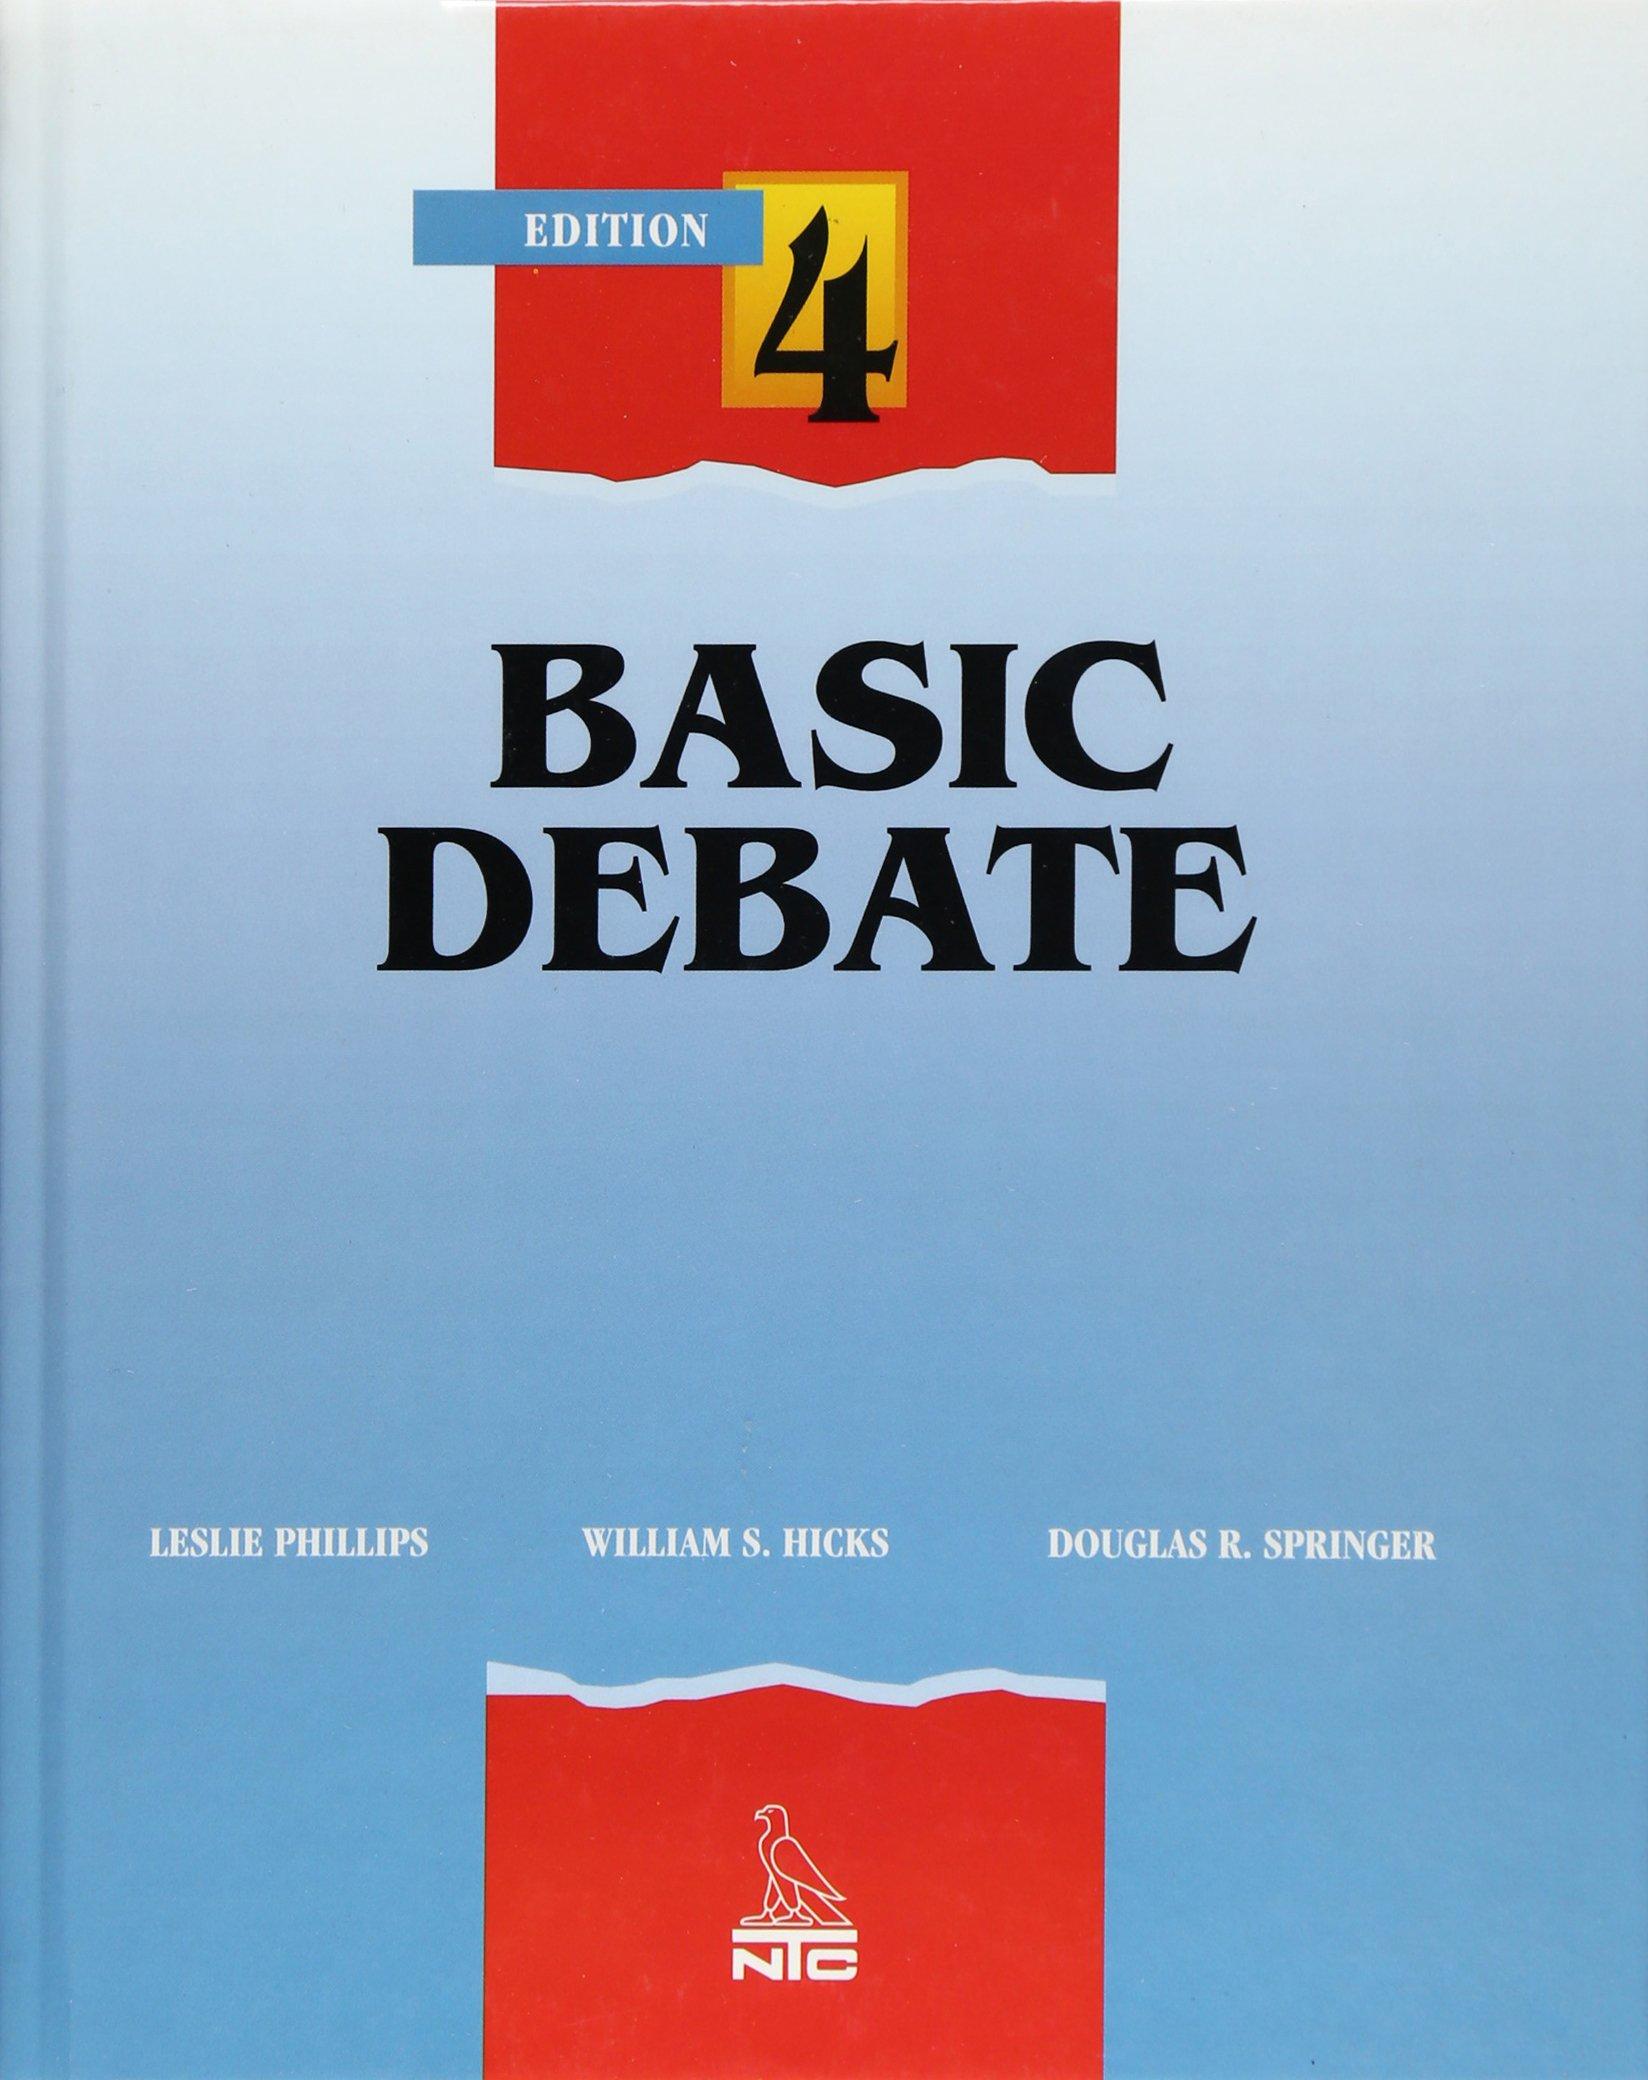 Debate, Student Edition